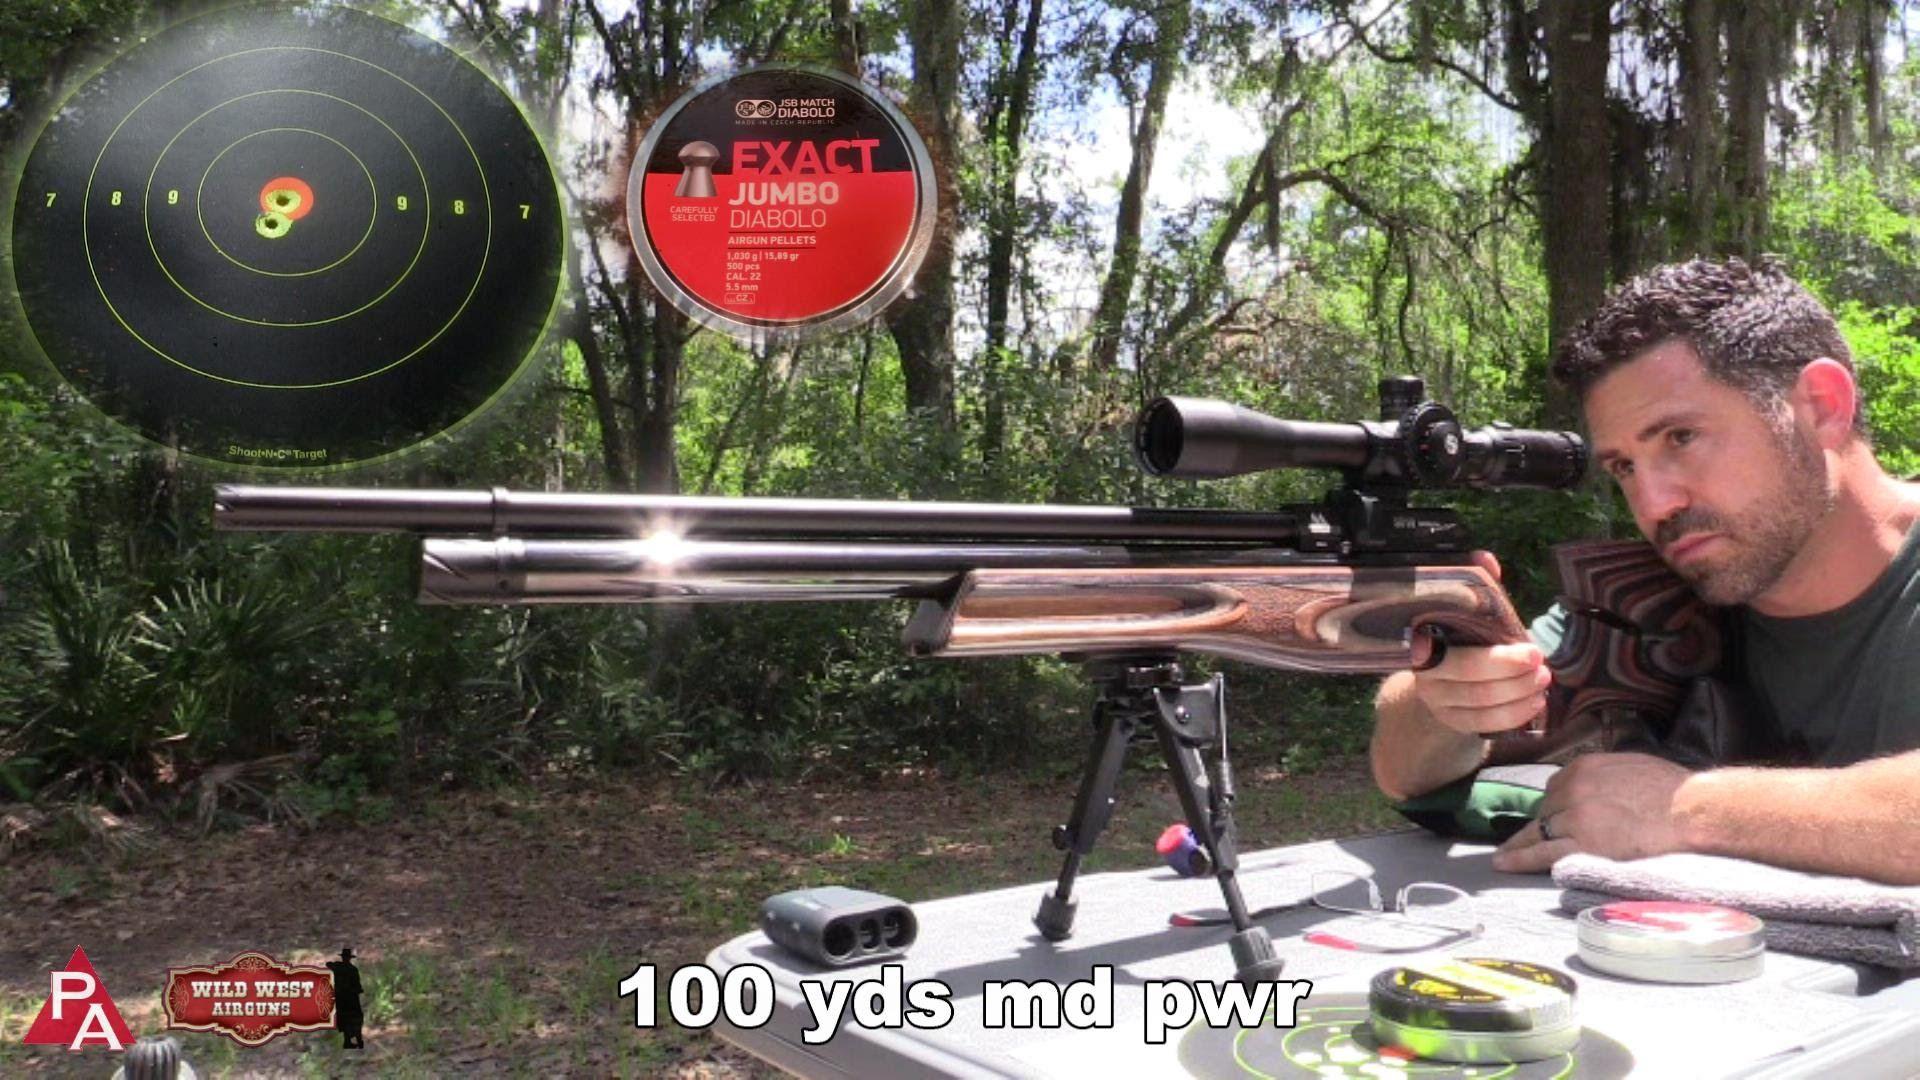 Pin on Airgun stuff